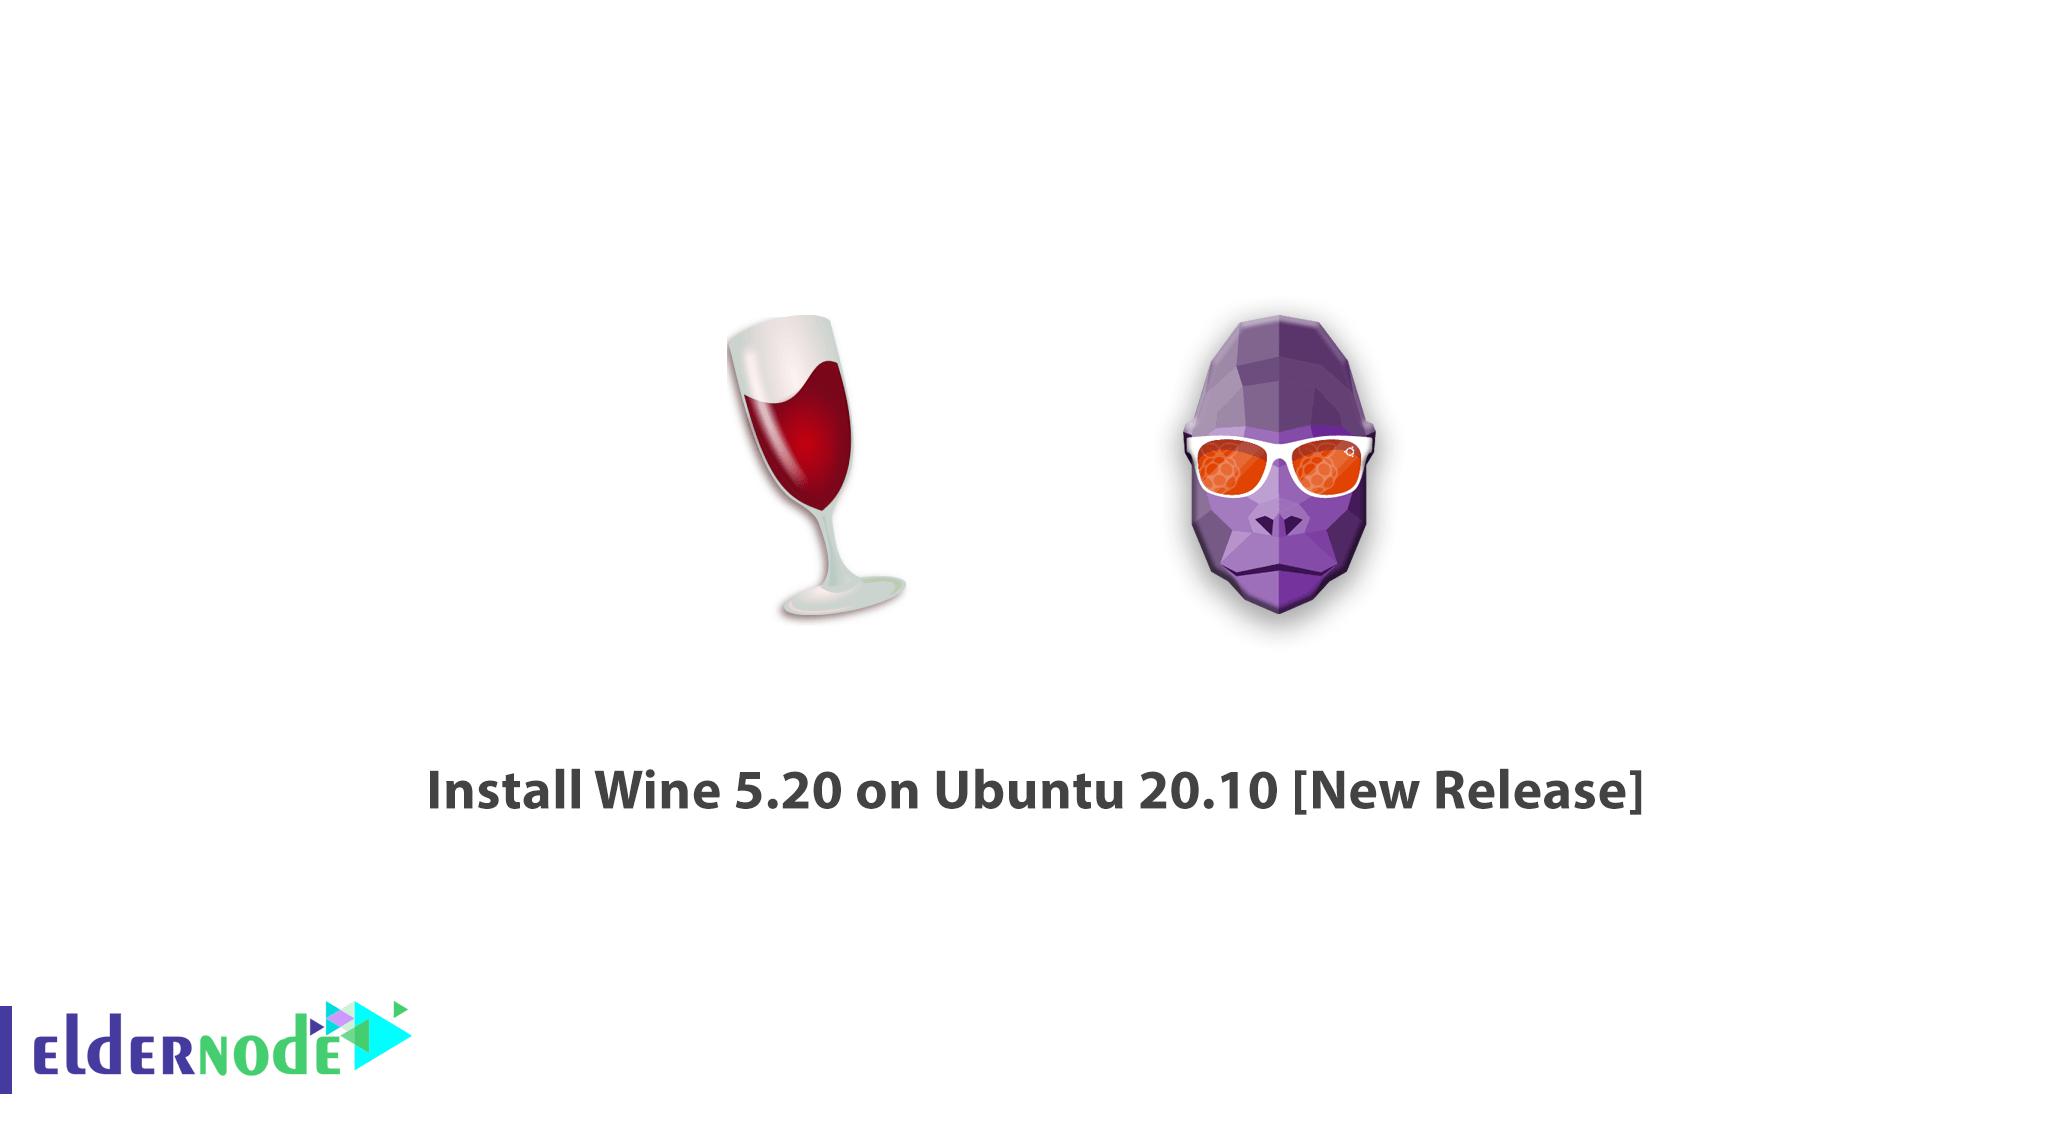 Install Wine 5.20 on Ubuntu 20.10 [New Release]